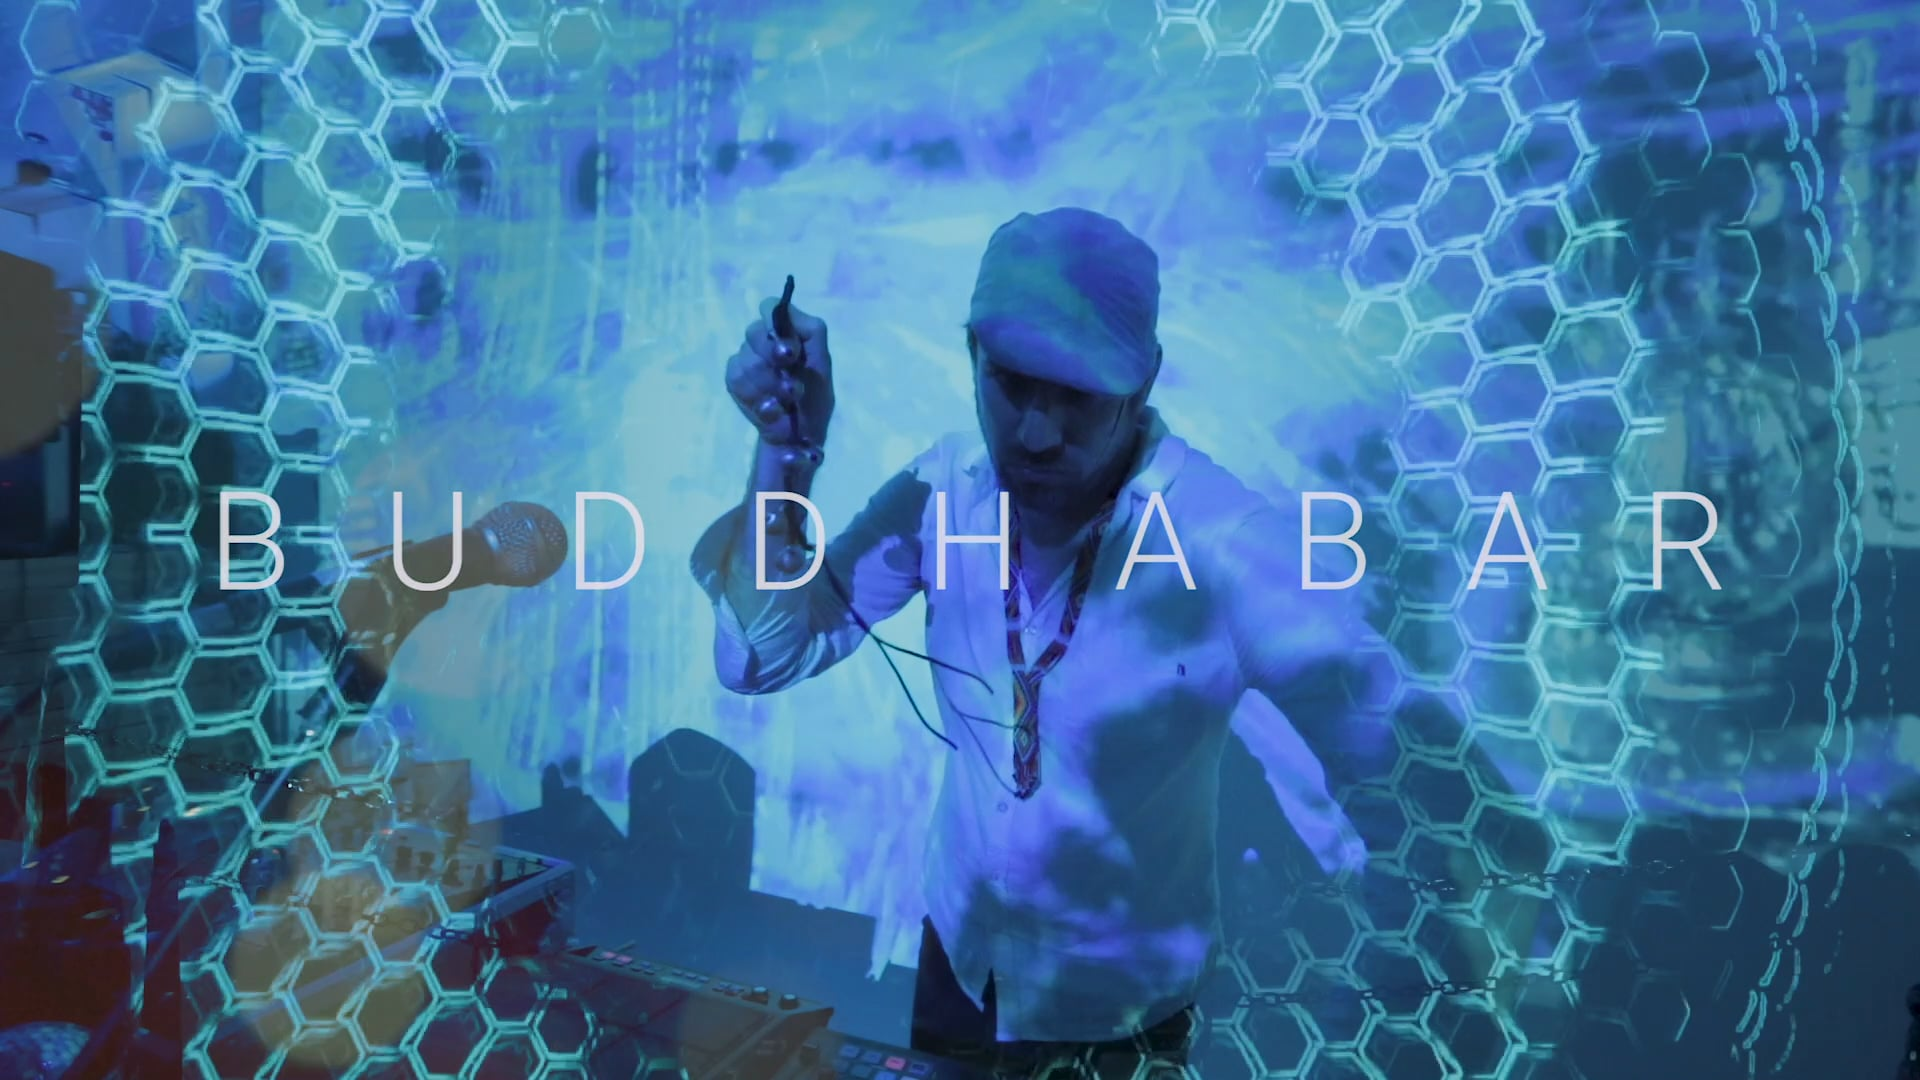 BuddhaBar Conscious Warehouse Party